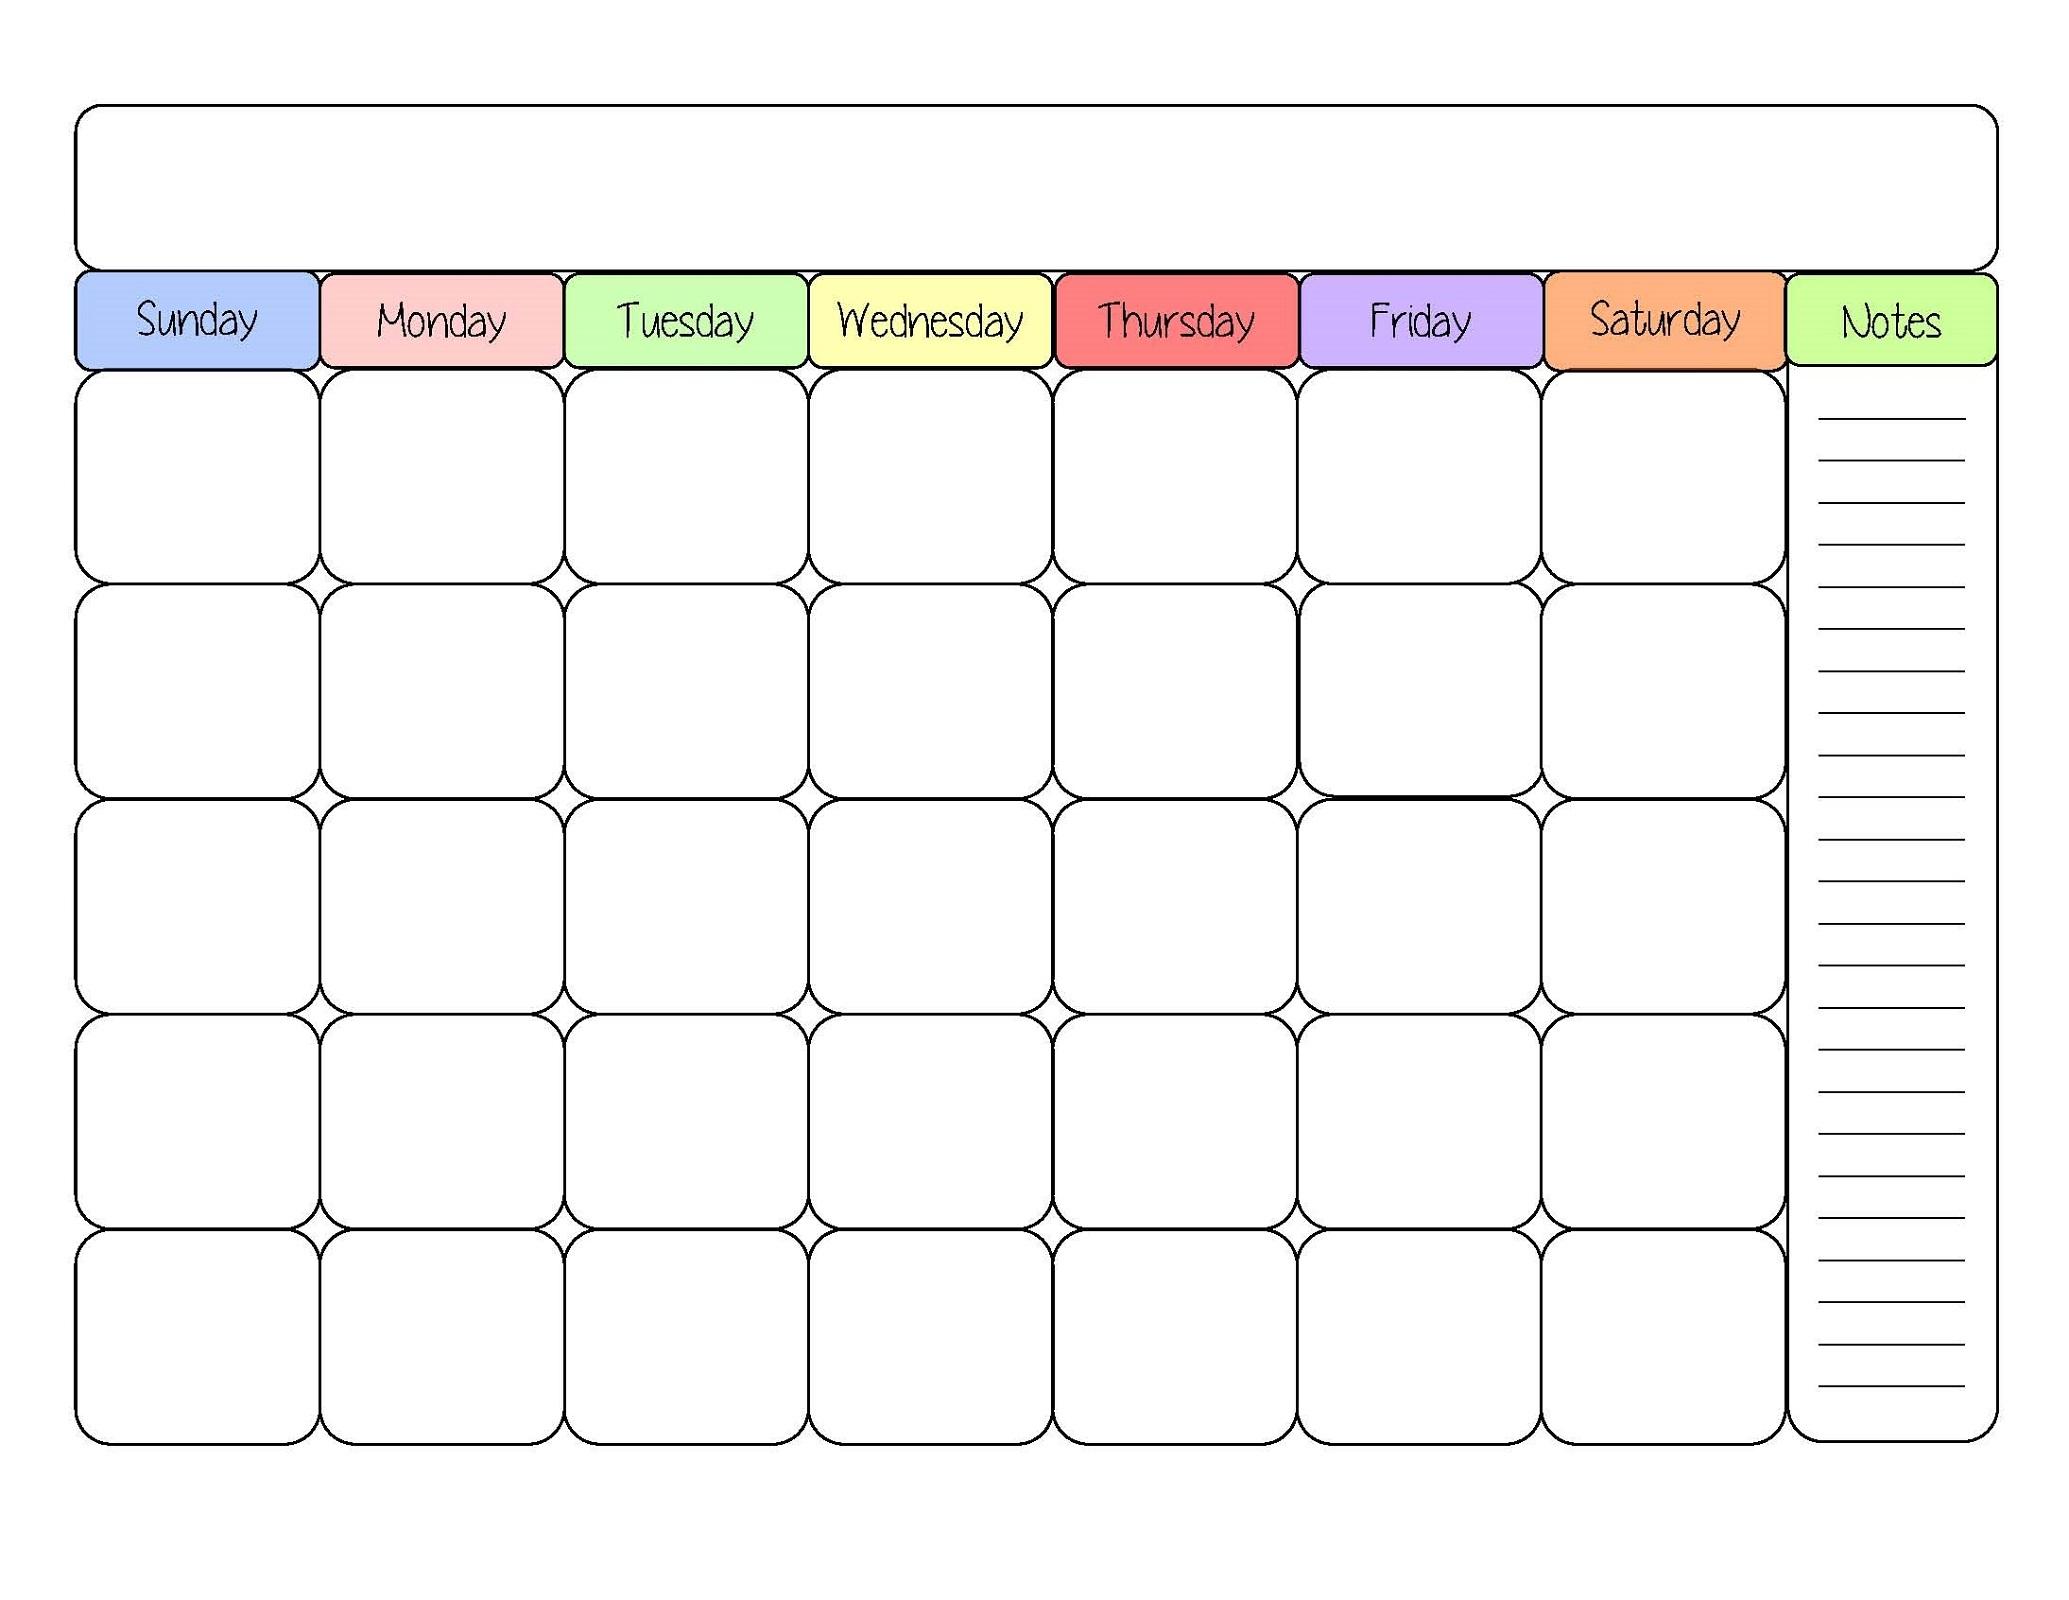 Free Printable Calendar Templates Activity Shelter3abry